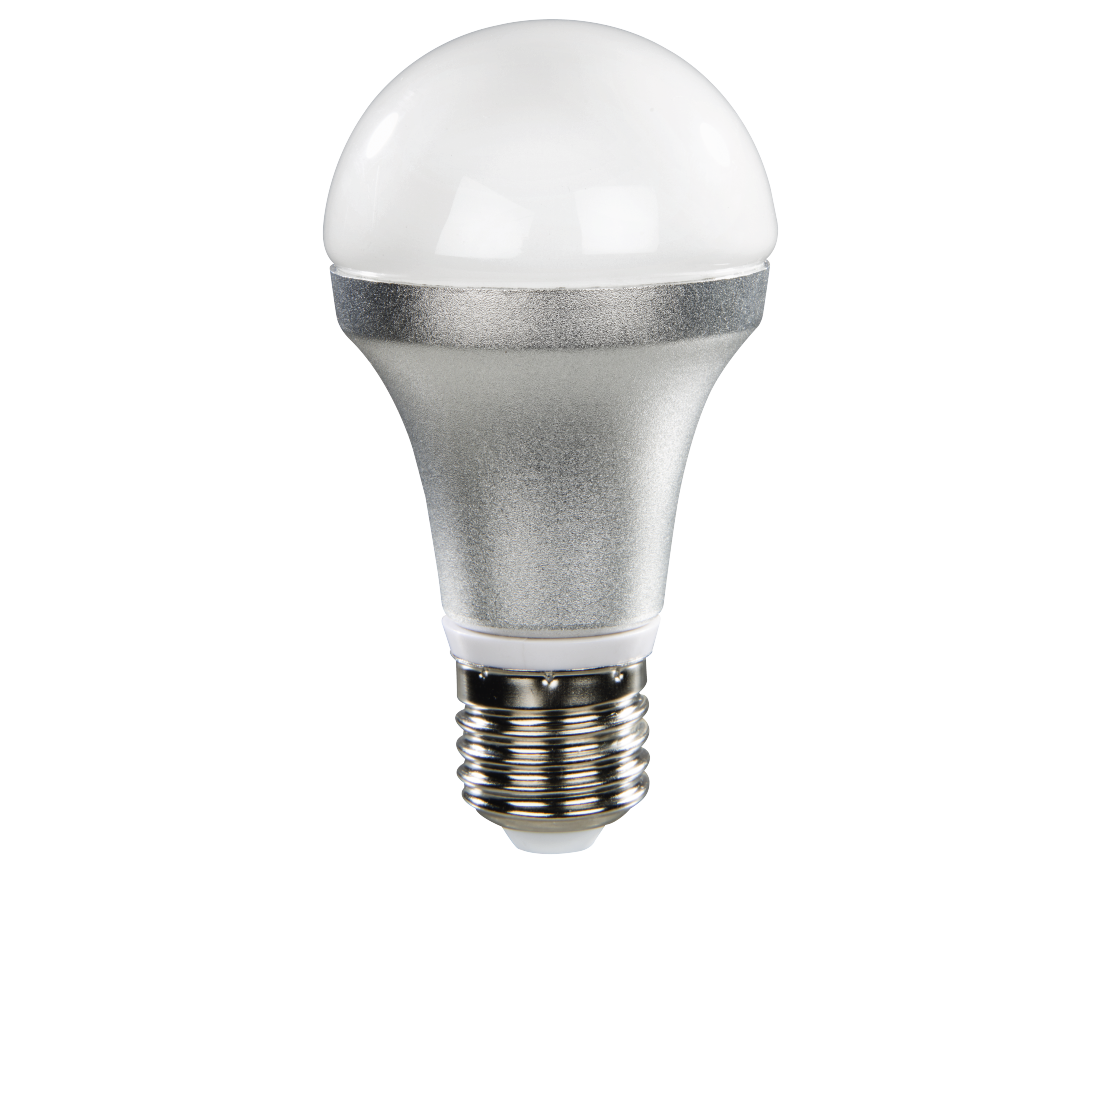 00112213 xavax led lampe e27 multicolour mit fernbedienung gl hlampenform. Black Bedroom Furniture Sets. Home Design Ideas